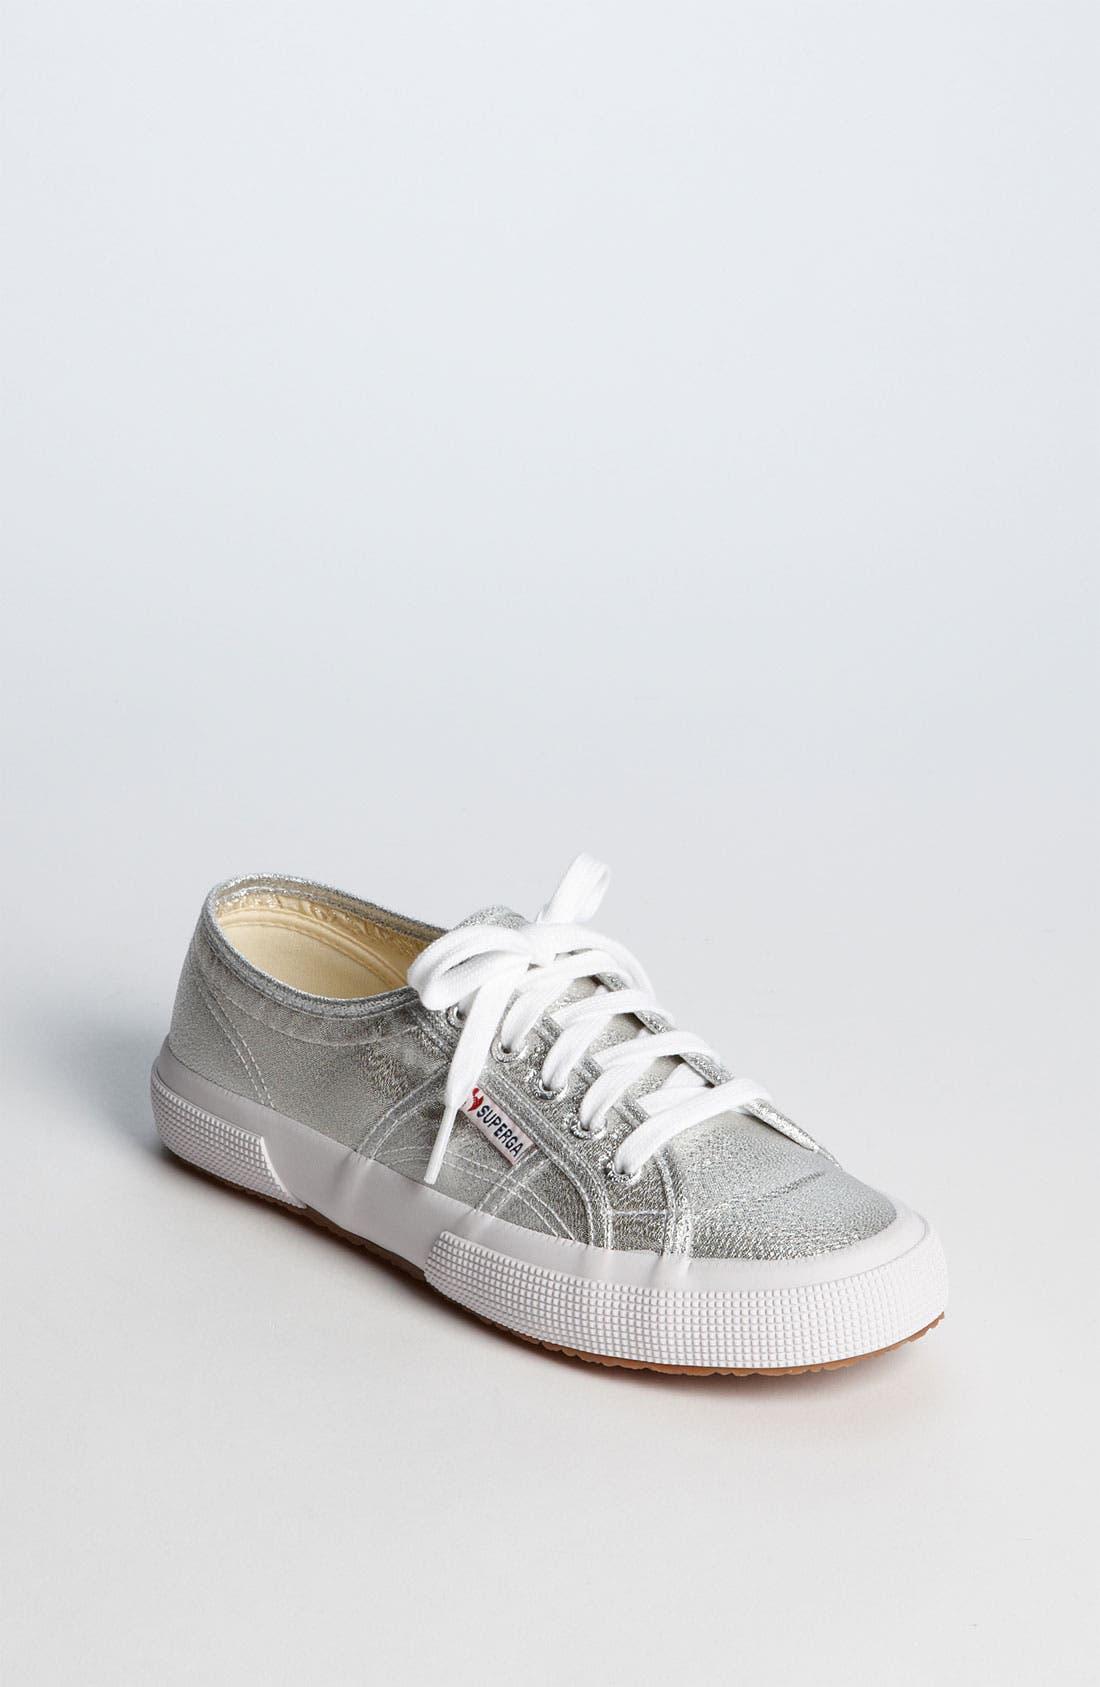 Main Image - Superga 'Lamé' Sneaker